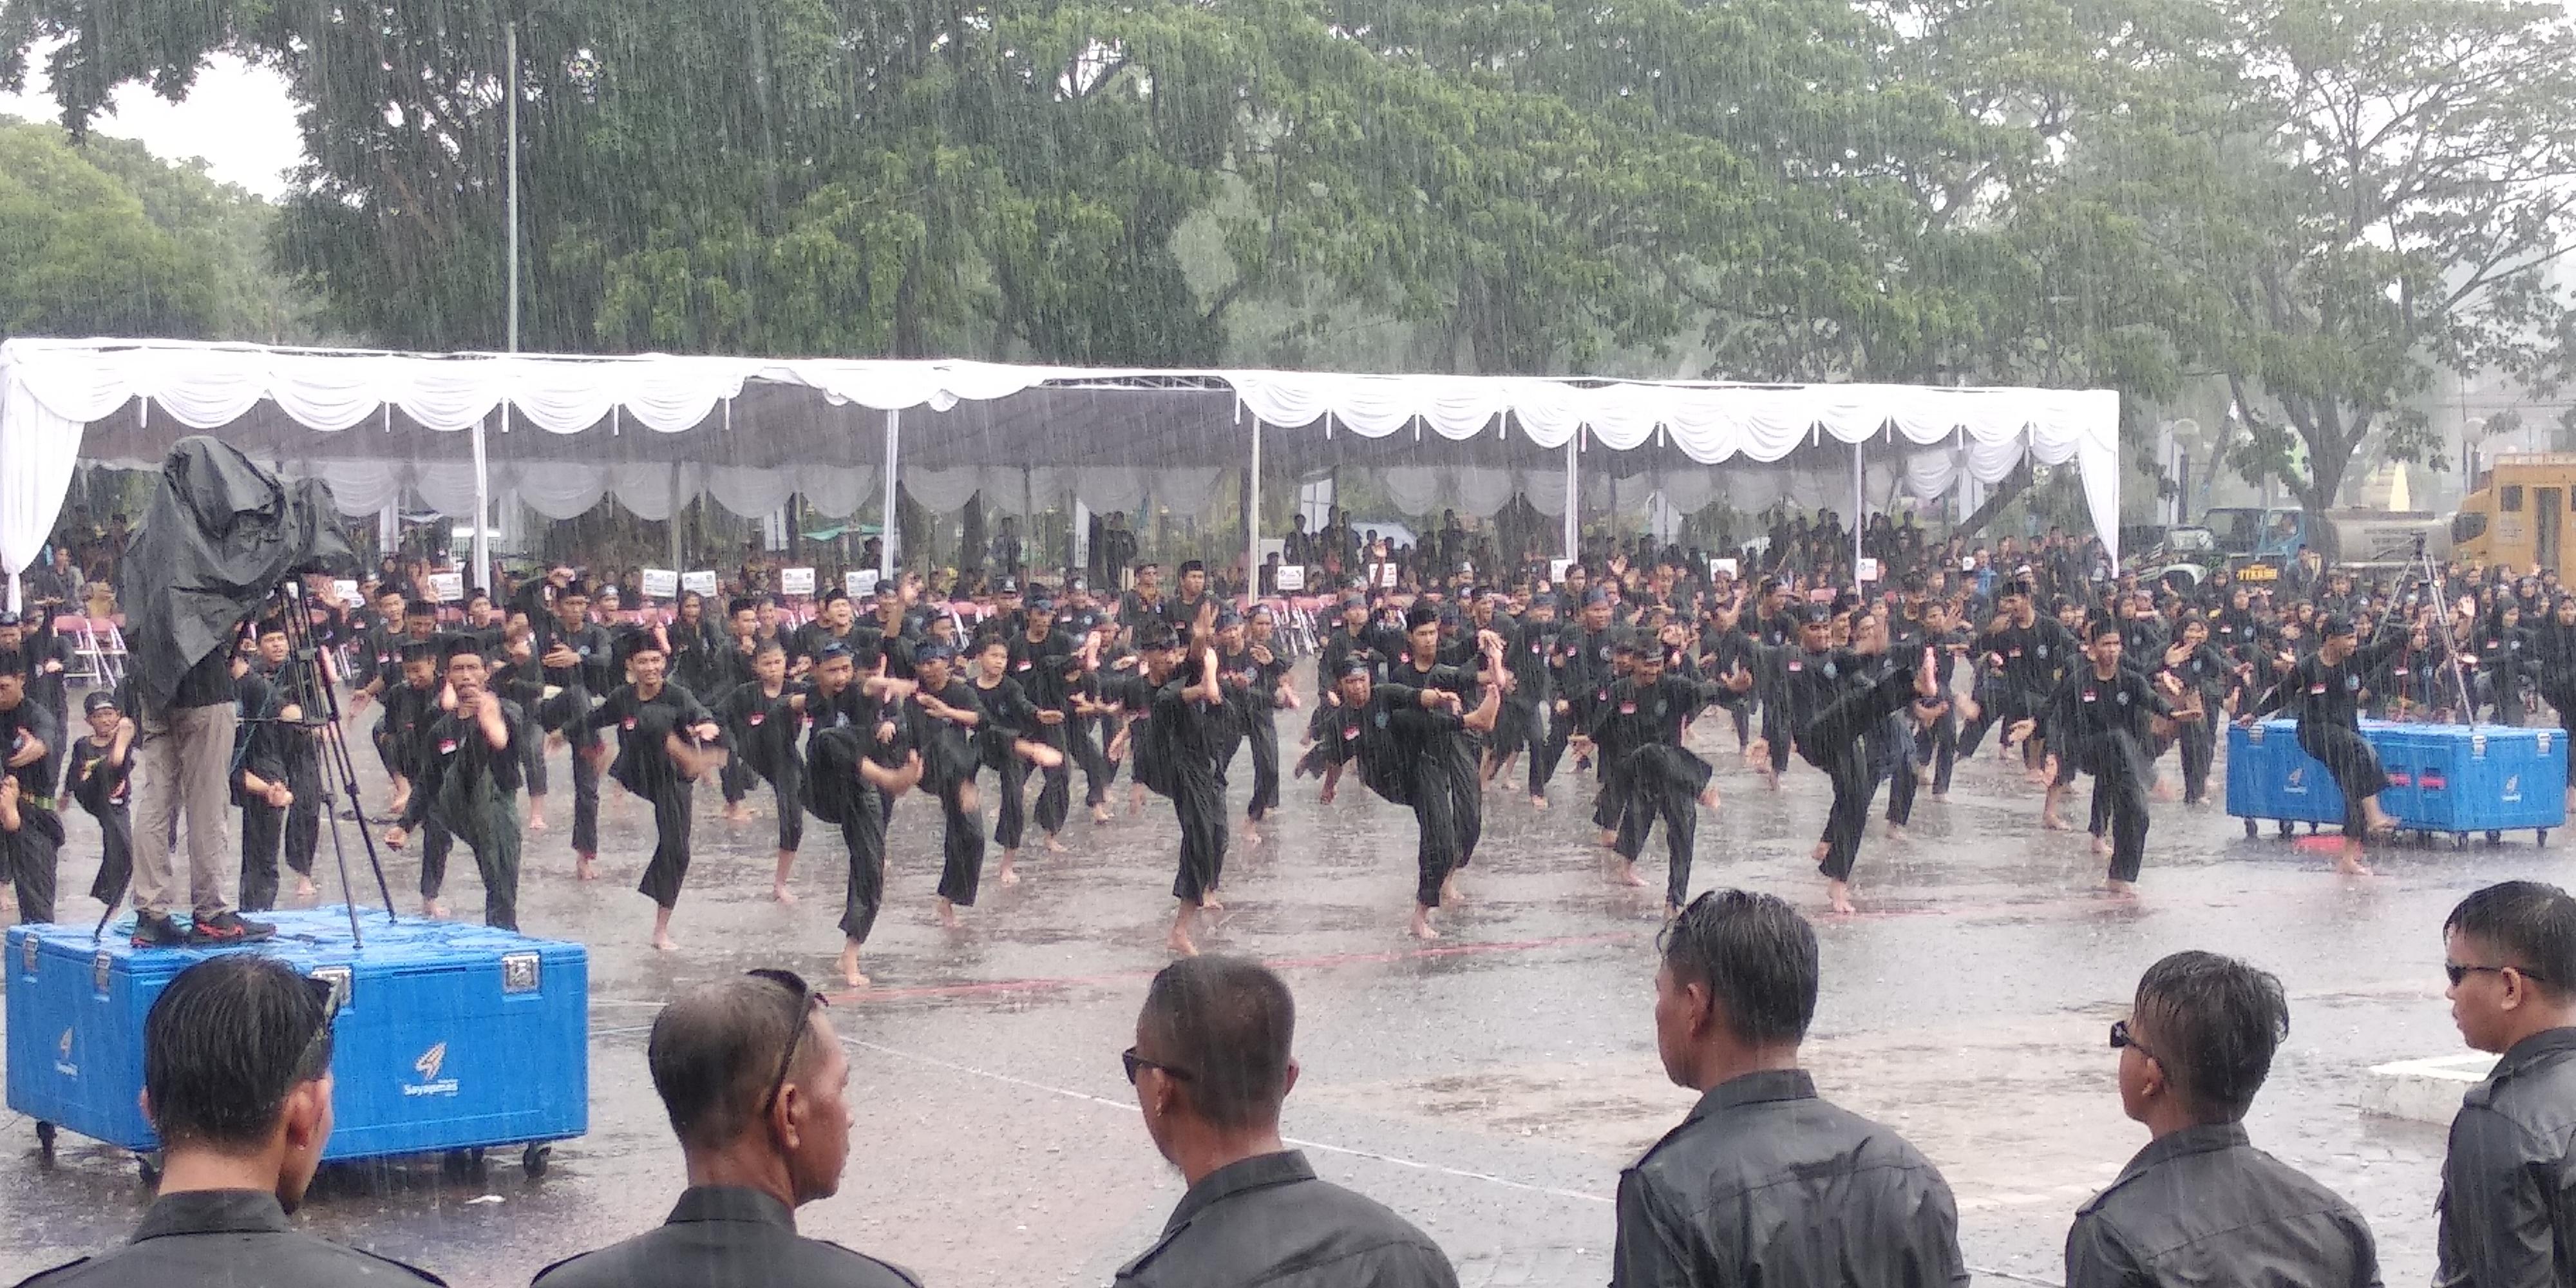 Acara Festival Silat Bandrong Dikepung Hujan Lebat, Ini yang Dilakukan Para Pendekar di Kota Serang